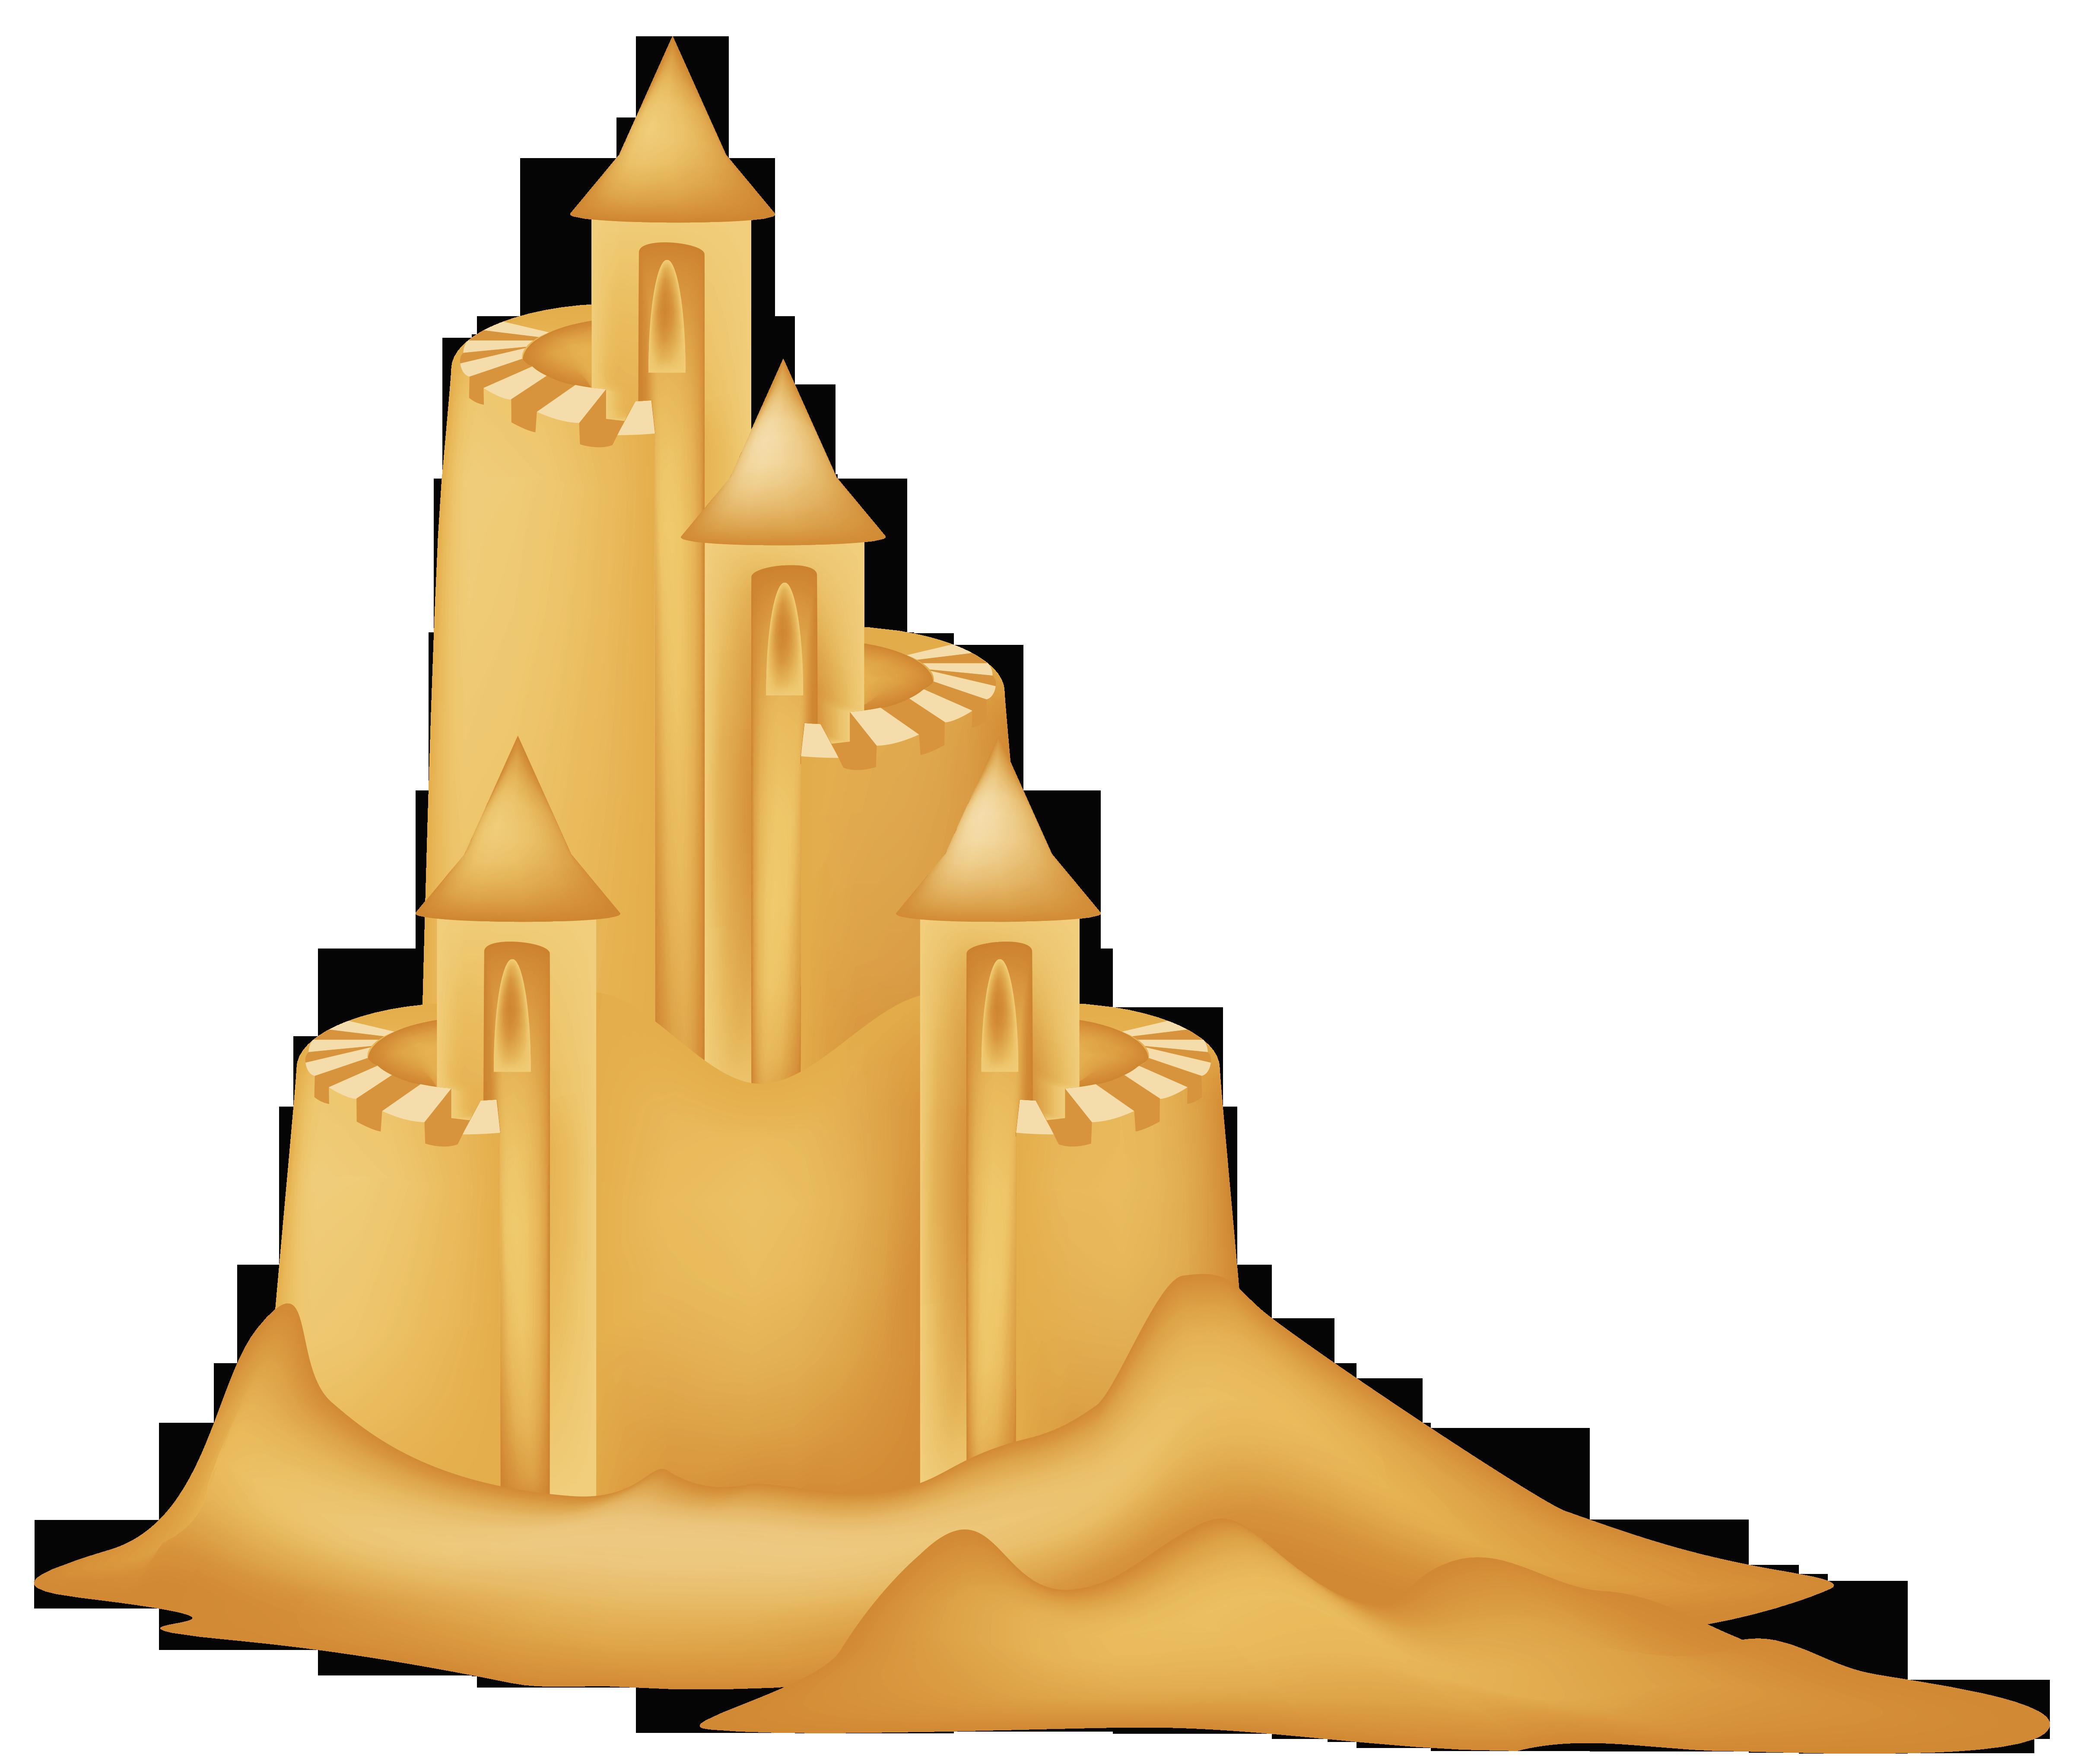 ... Sand Clip Art - clipartal - Sand Clip Art